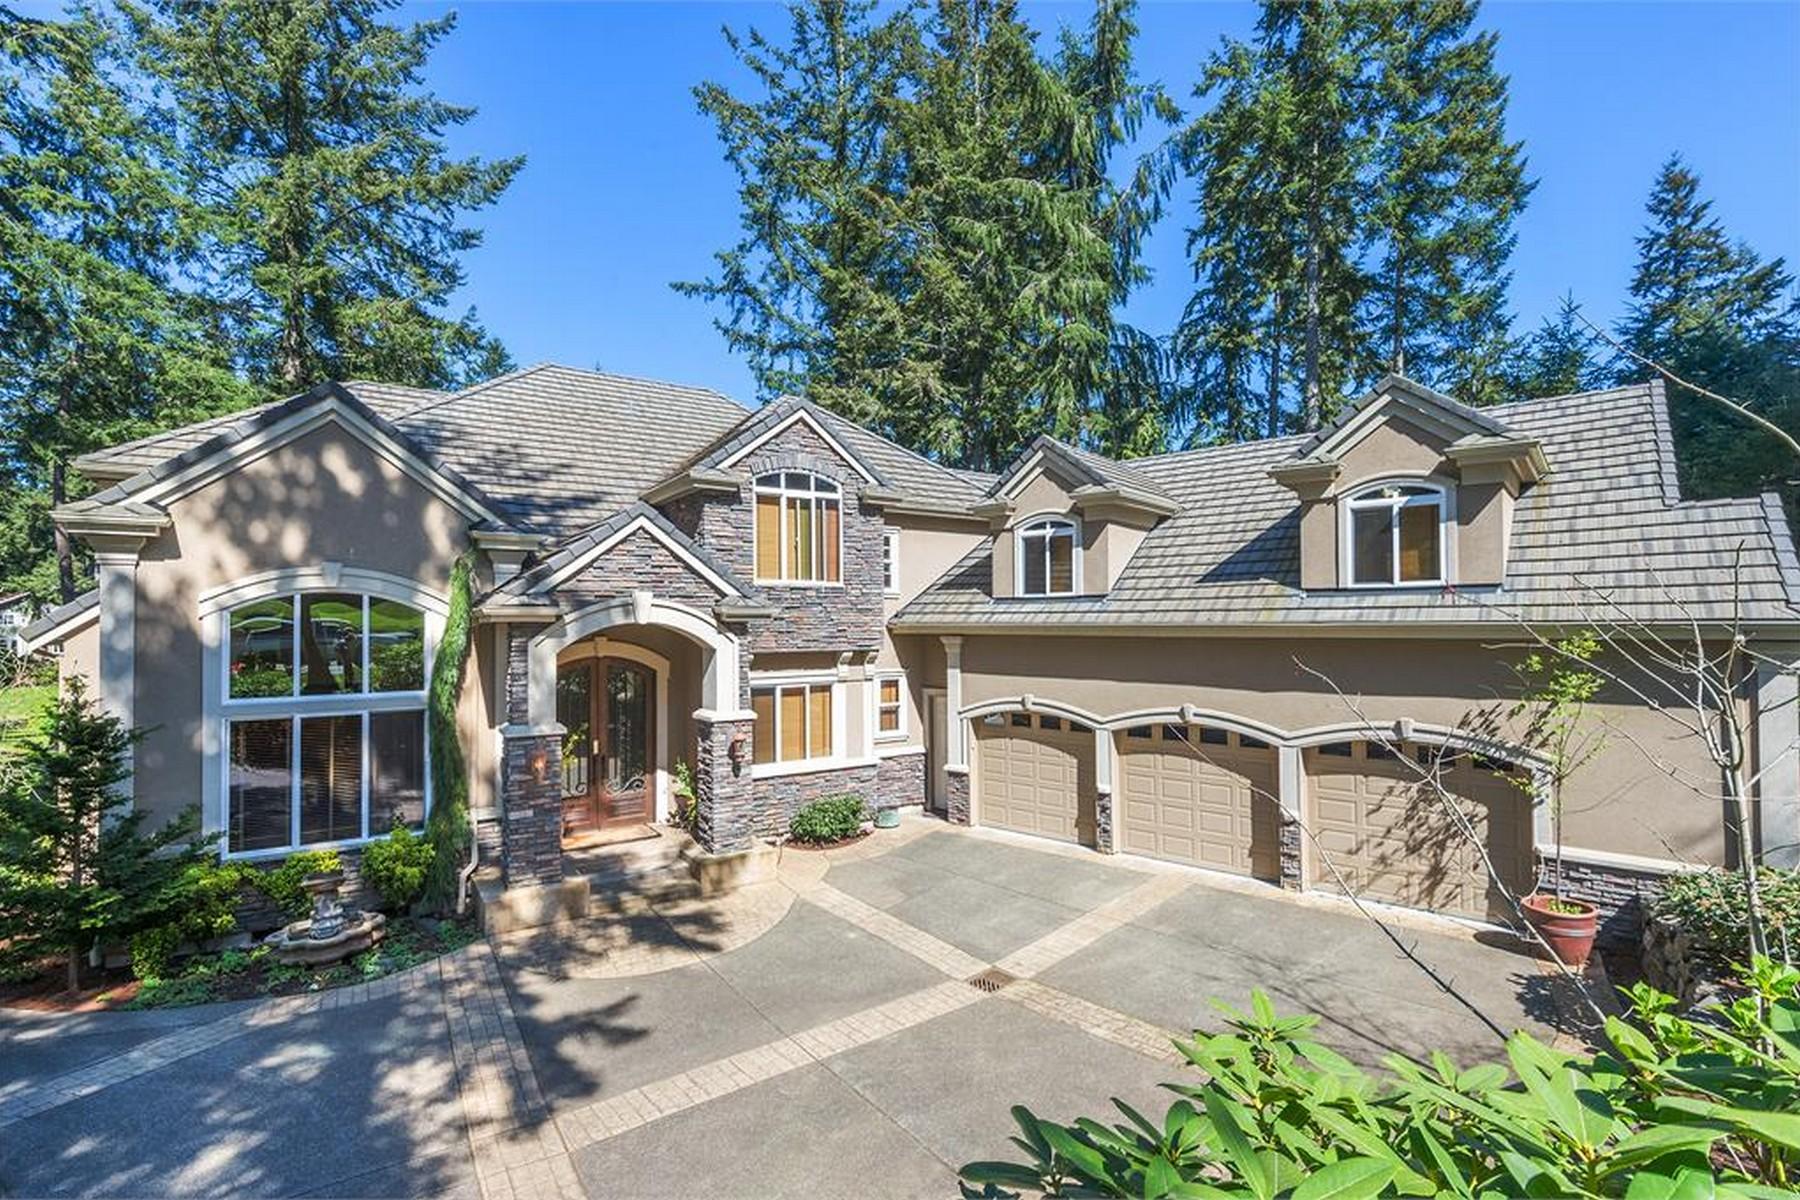 Single Family Home for Sale at Exquisite Canterwood Fairway Estate 4921 Saddleback Drive NW Gig Harbor, Washington, 98332 United States